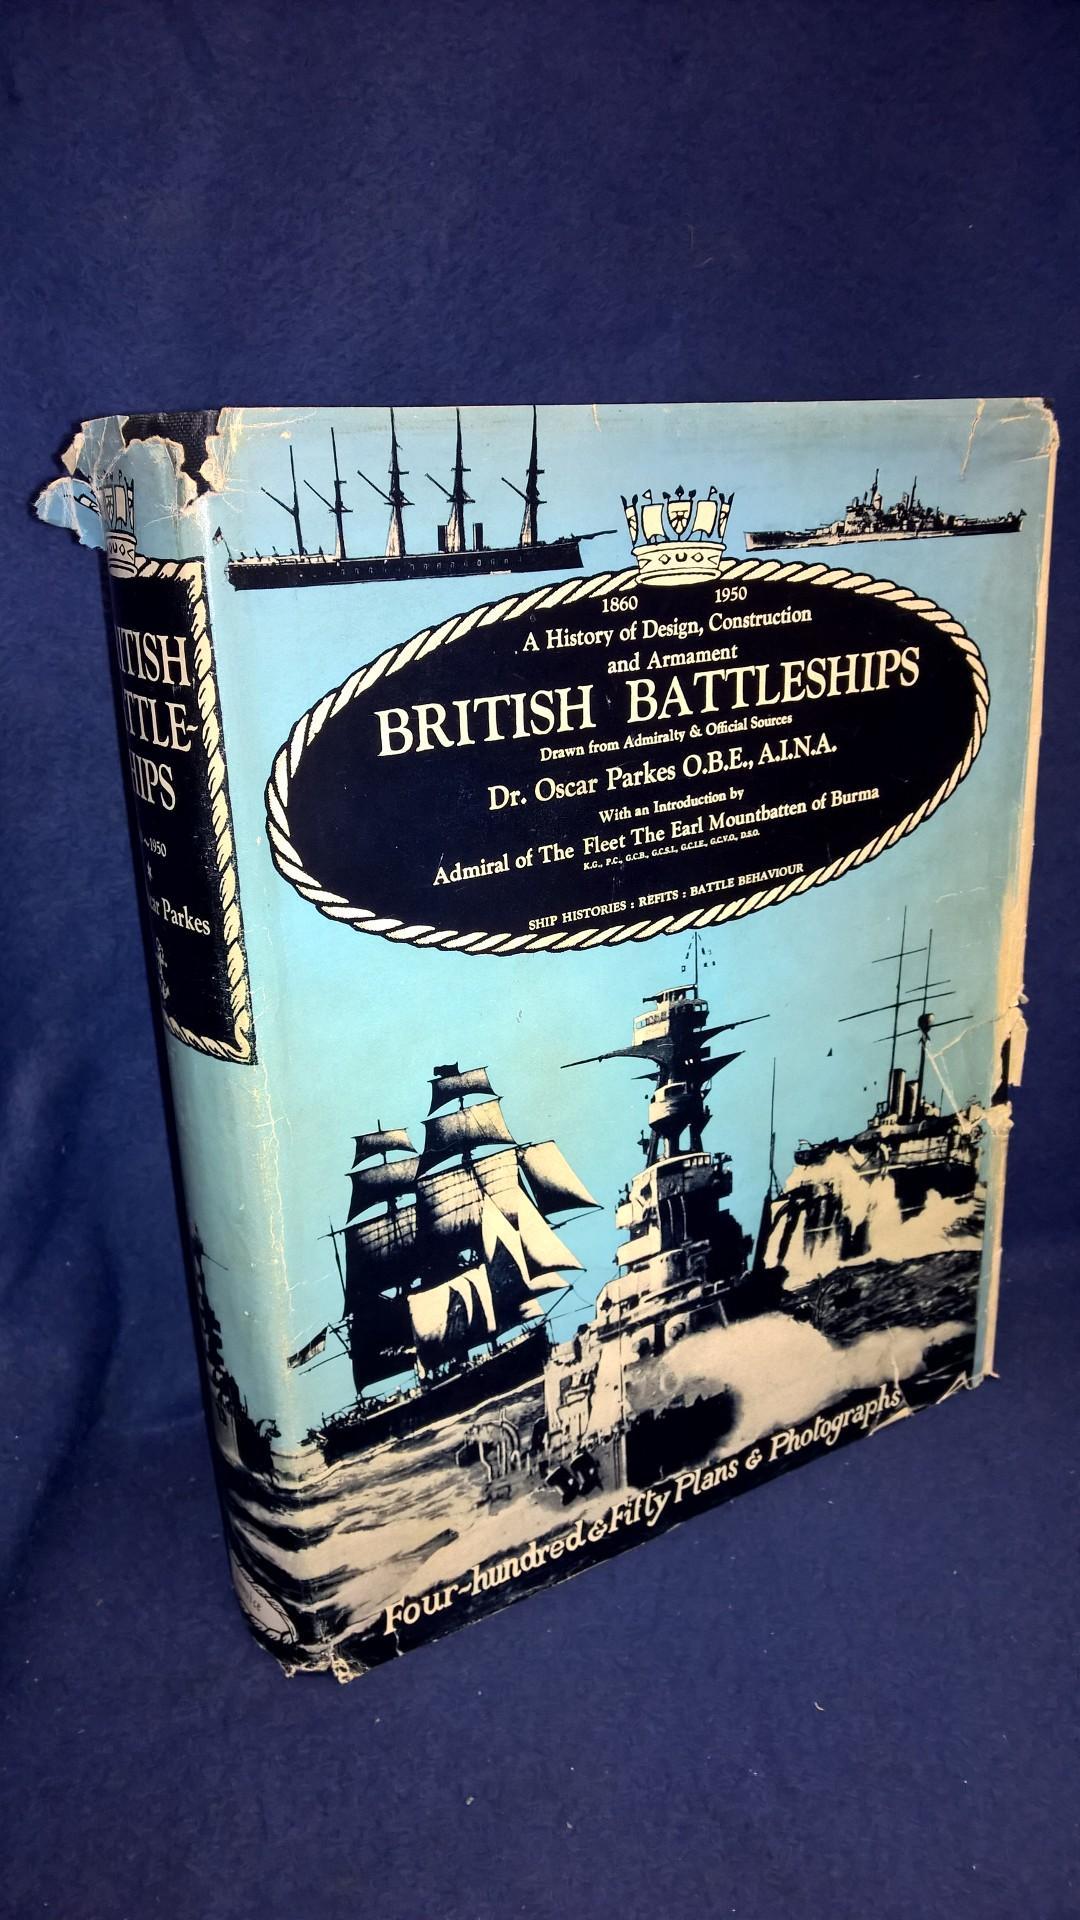 British Battleships 1860-1950. A History of Design, Construction and Armament.